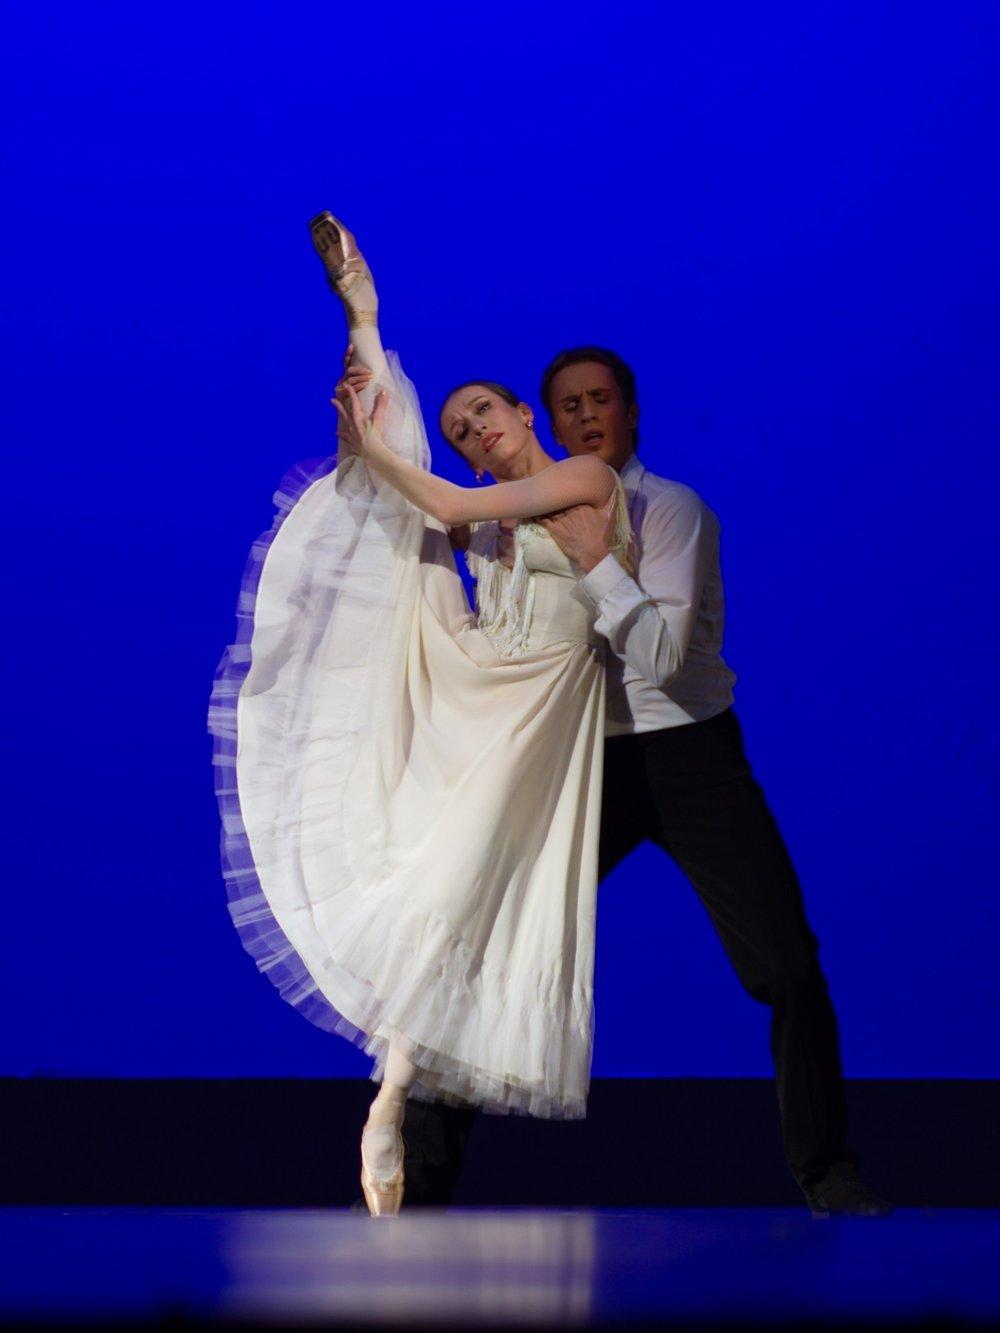 Marianna Ryzhkina, Bolshoi Ballet & Andrey Merkuriev, Bolshoi Ballet